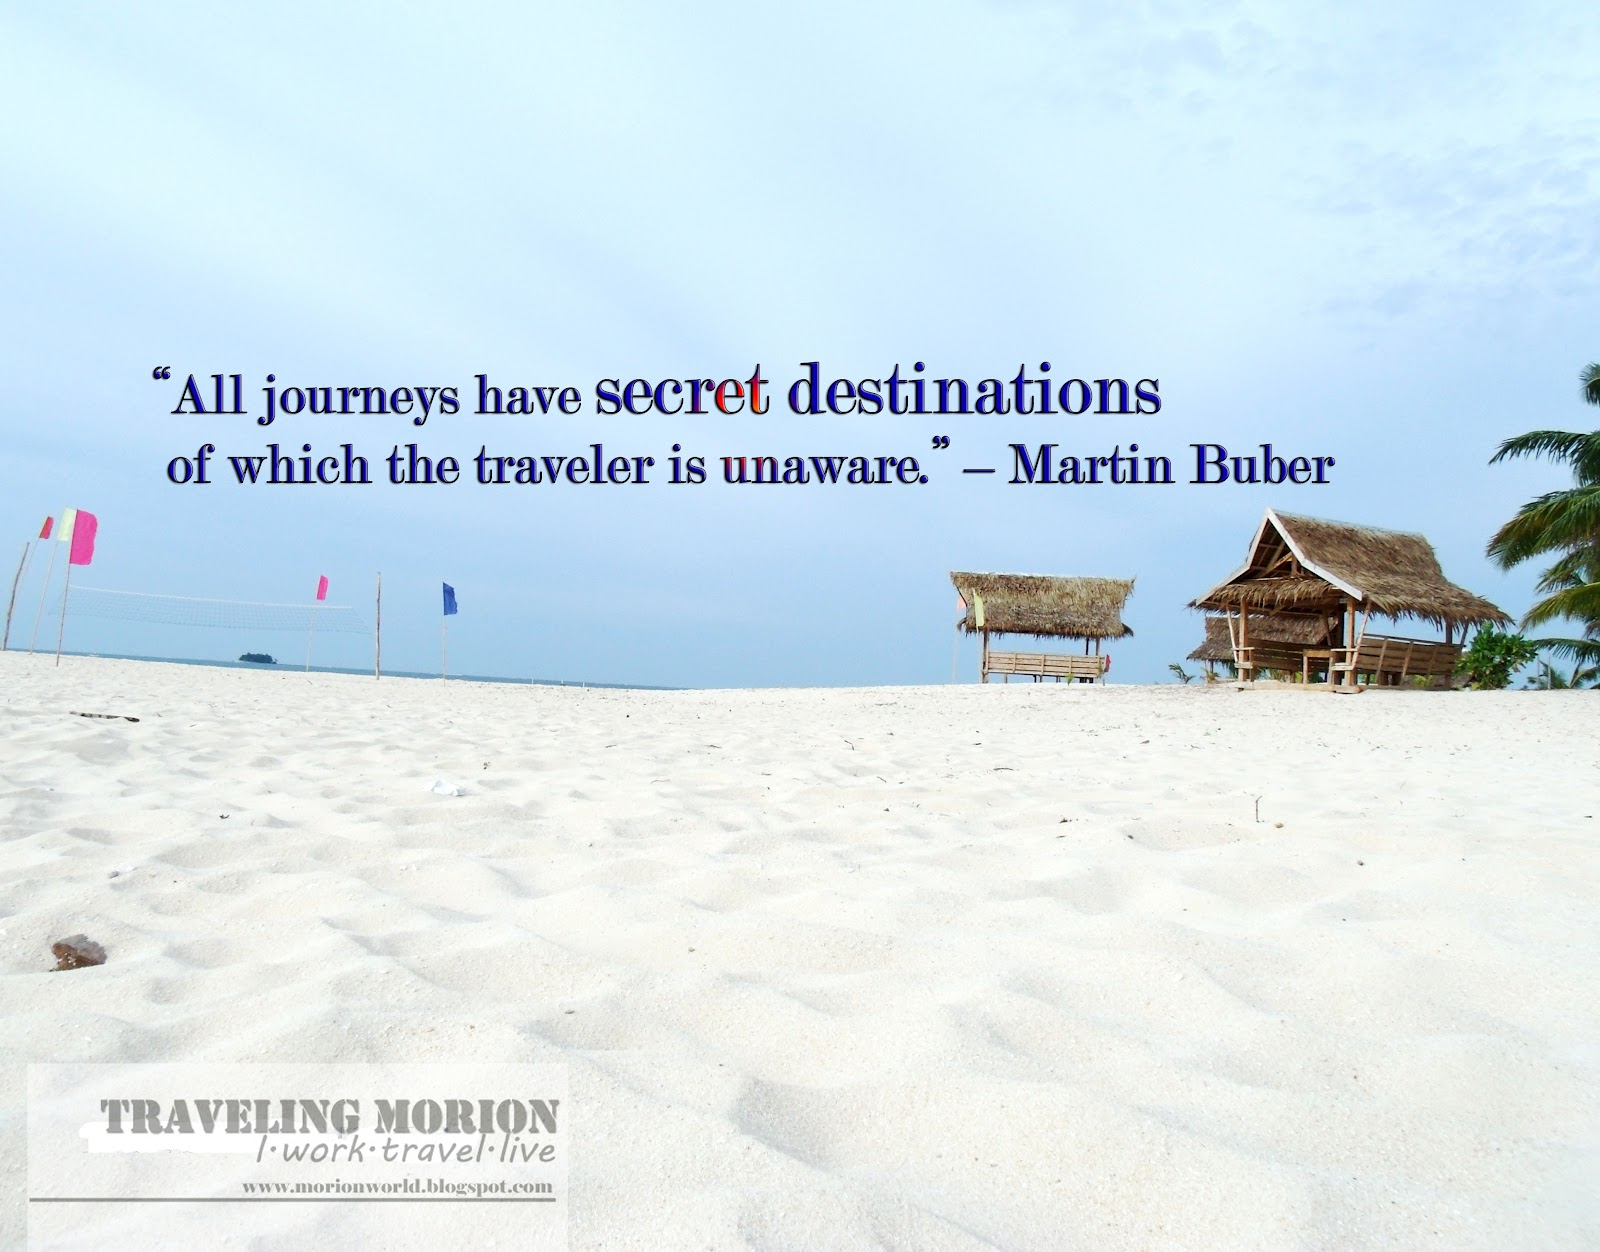 traveling morion let s explore 7107 islands phototravel diaries